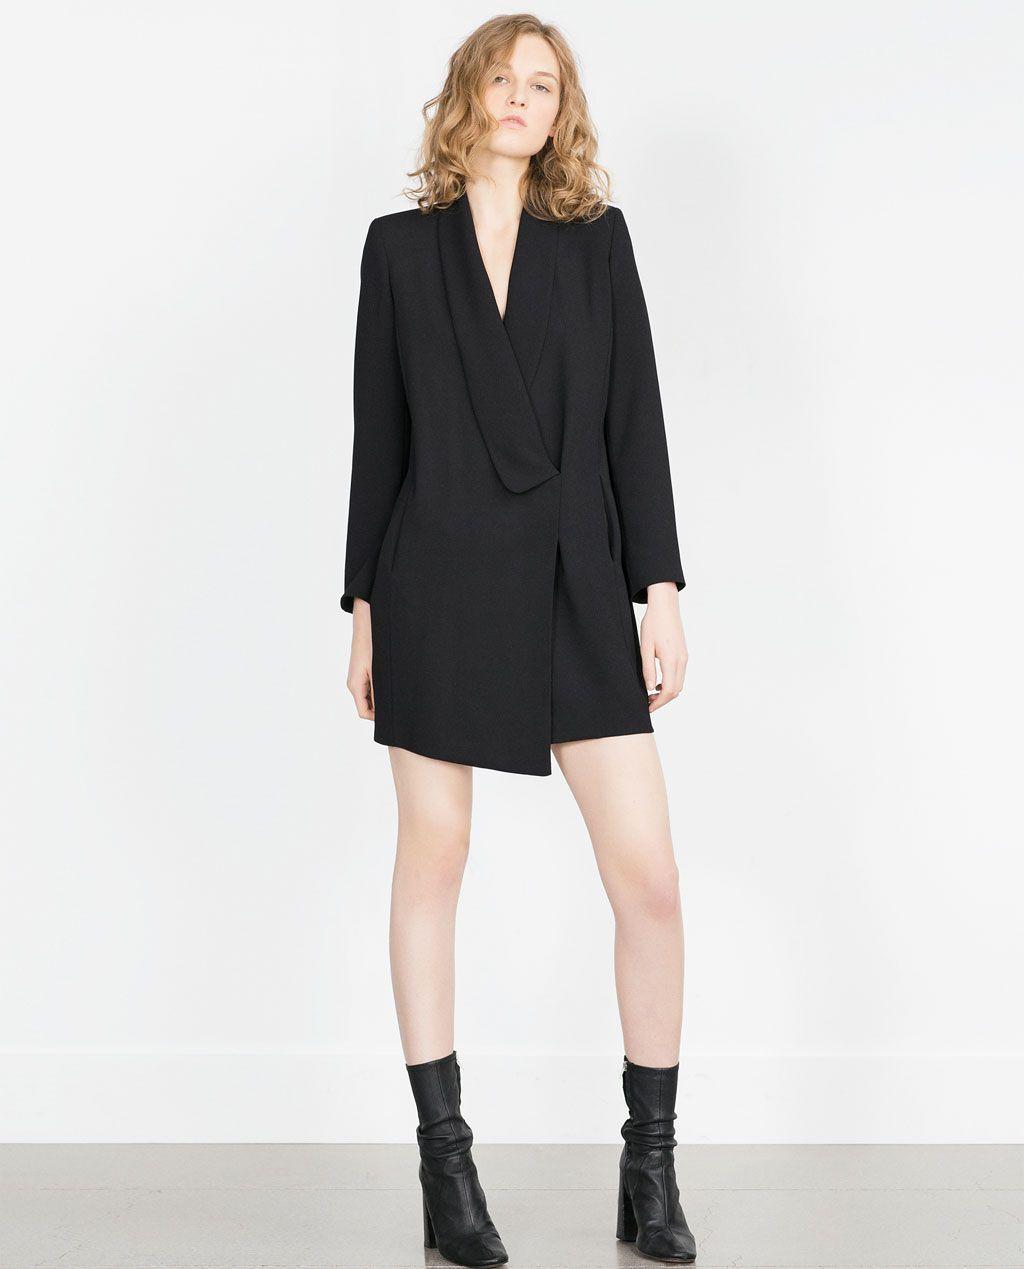 Image 1 Of Shawl Collar Dress From Zara Wl Pinterest Dresses